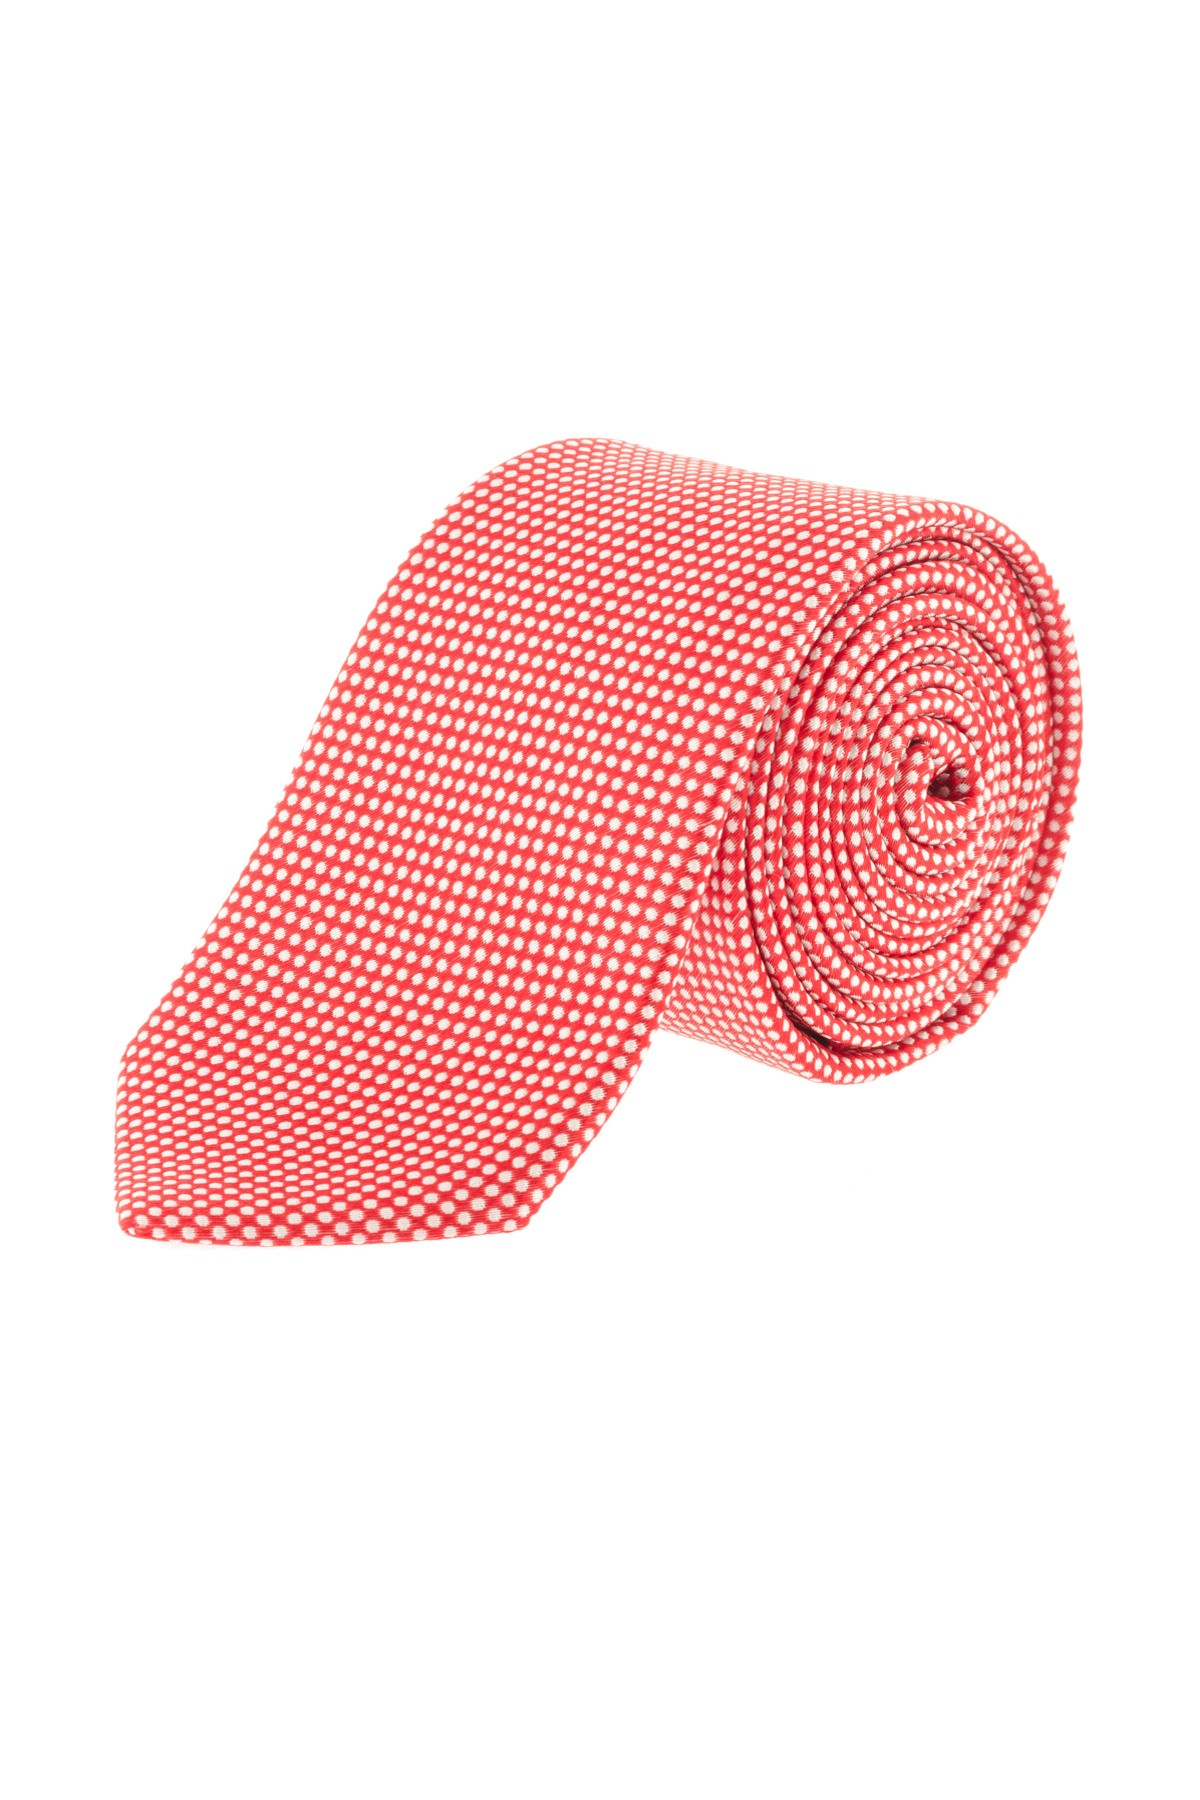 P/E 16 Cravatta arancione a pois bianchi RIONE FONTANA - Rione Fontana